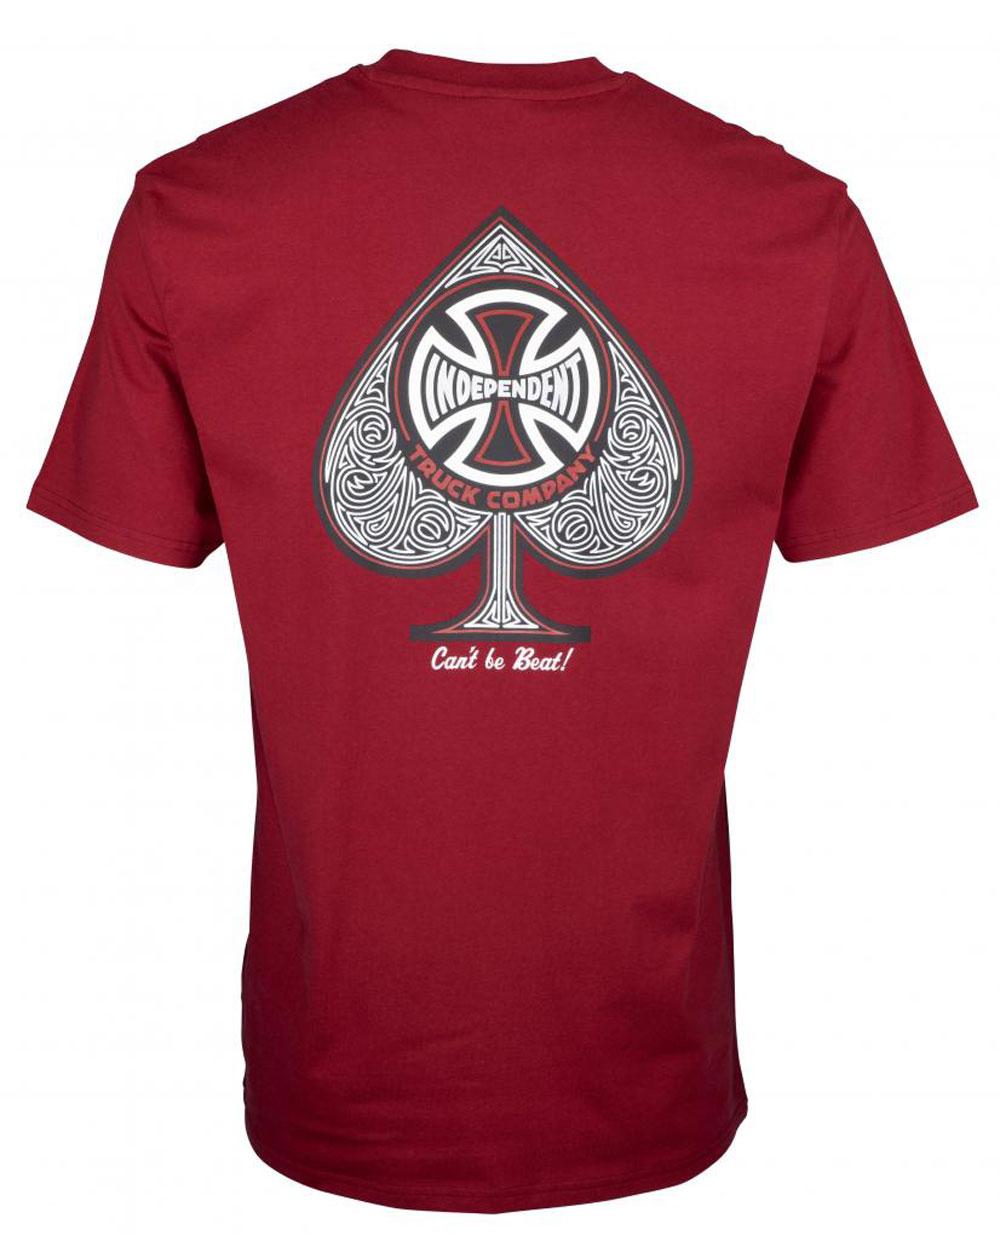 Independent Men's T-Shirt CBB Cross Spade Maroon